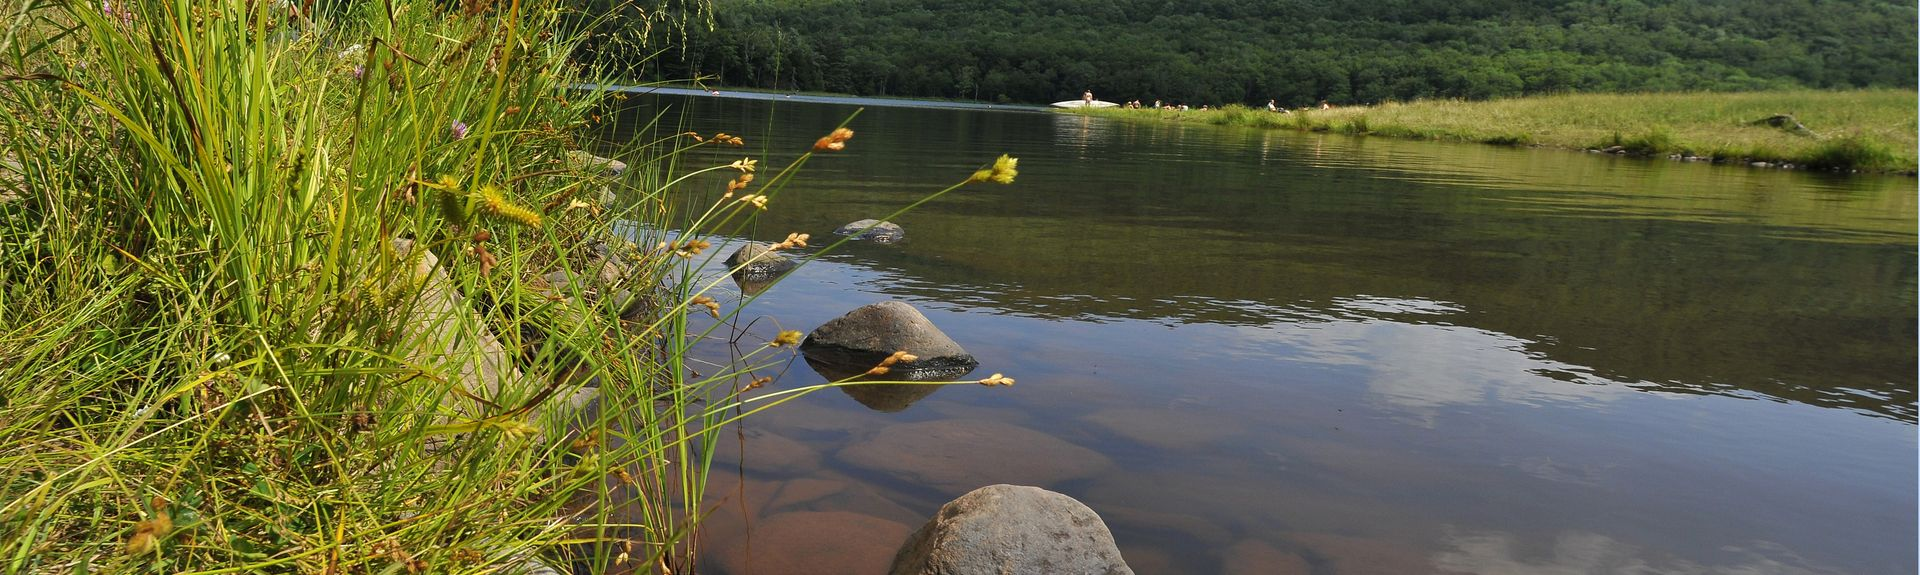 Catskill, New York, Verenigde Staten